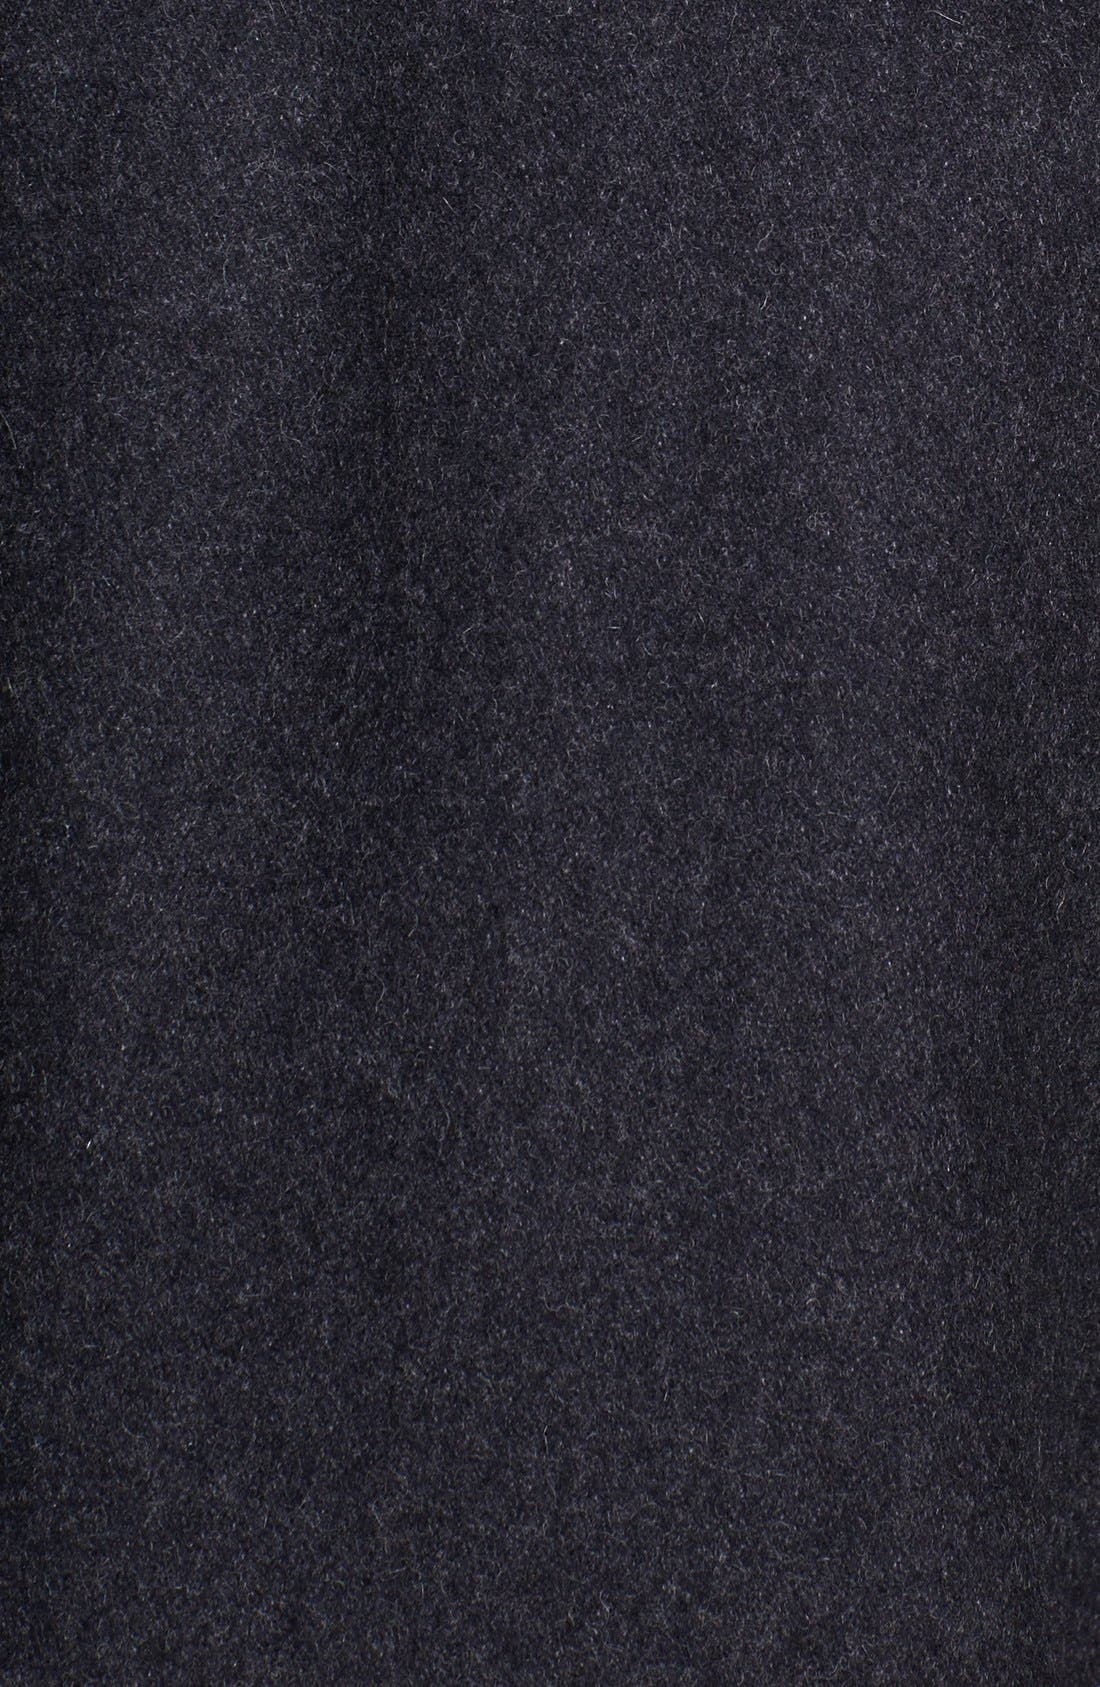 Alternate Image 3  - Victorinox Swiss Army® 'Shuttle' Wool Blend Coat